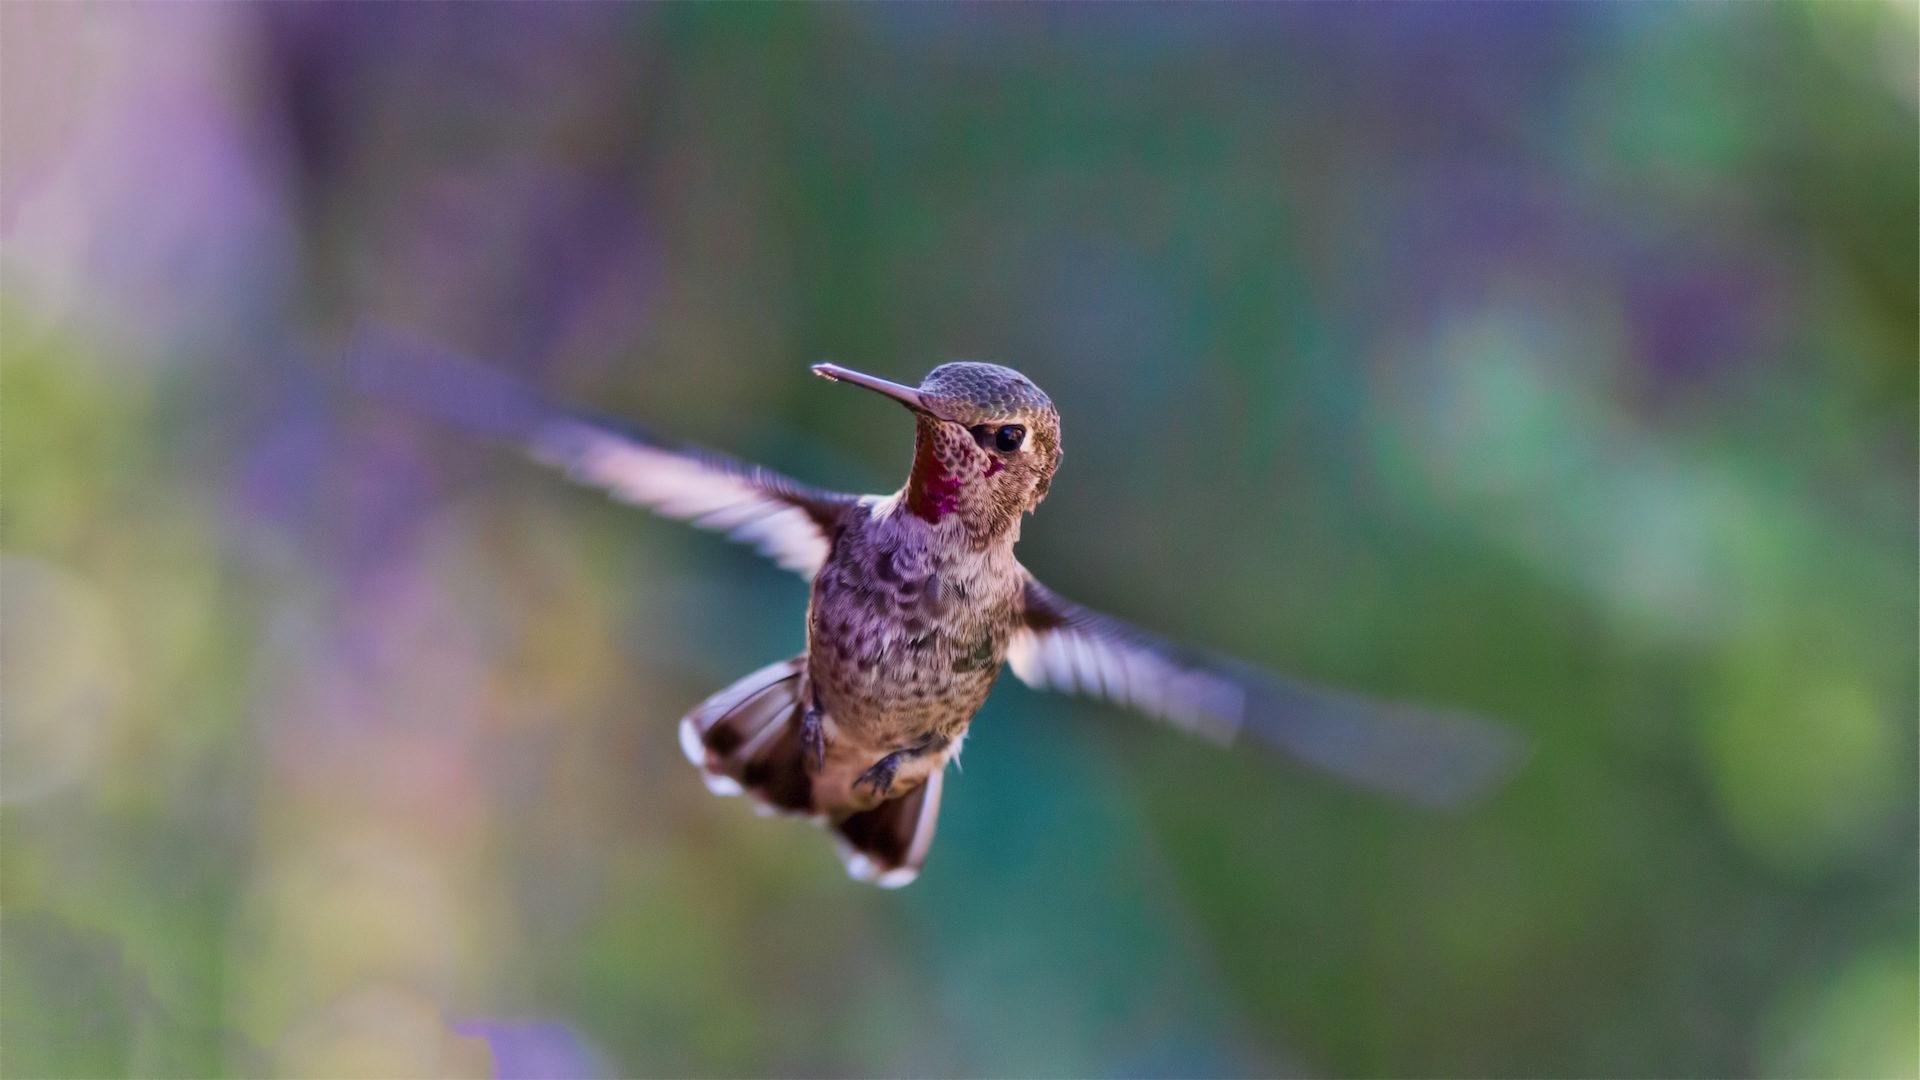 colibrí, 翼, 鳥, 飛ぶ, aleteo - HD の壁紙 - 教授-falken.com